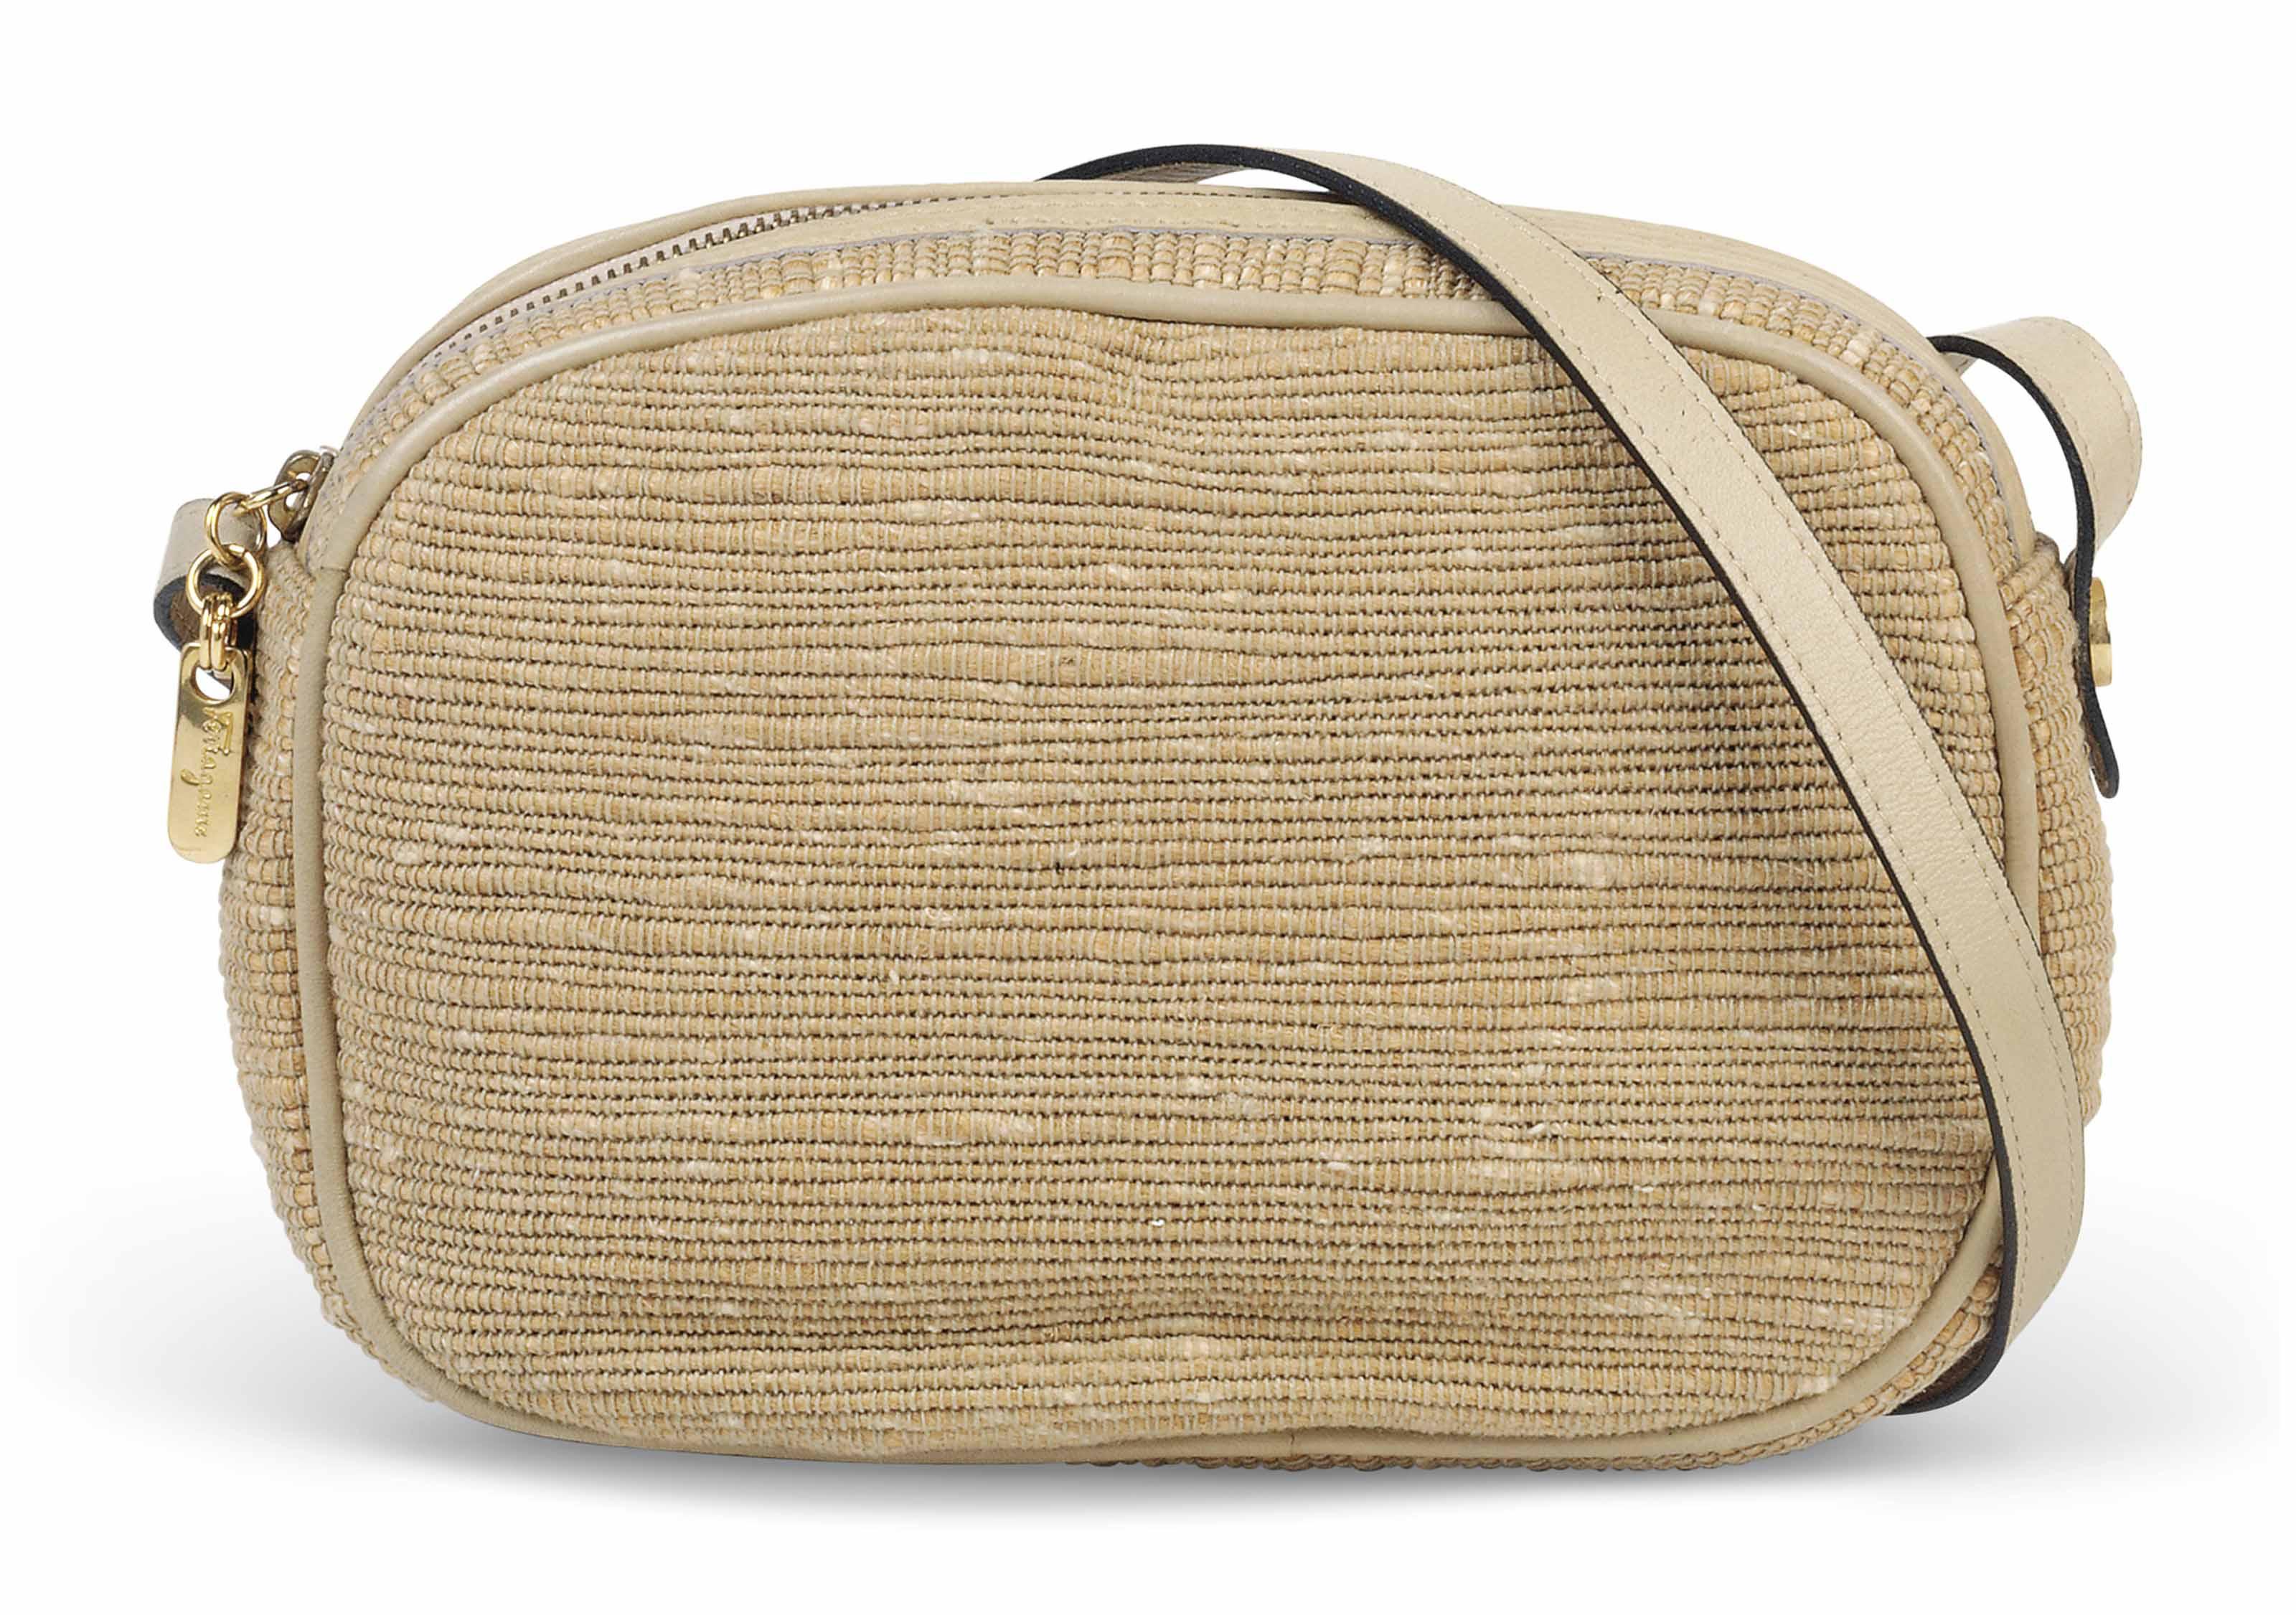 A SMALL RECTANGULAR SHOULDER BAG